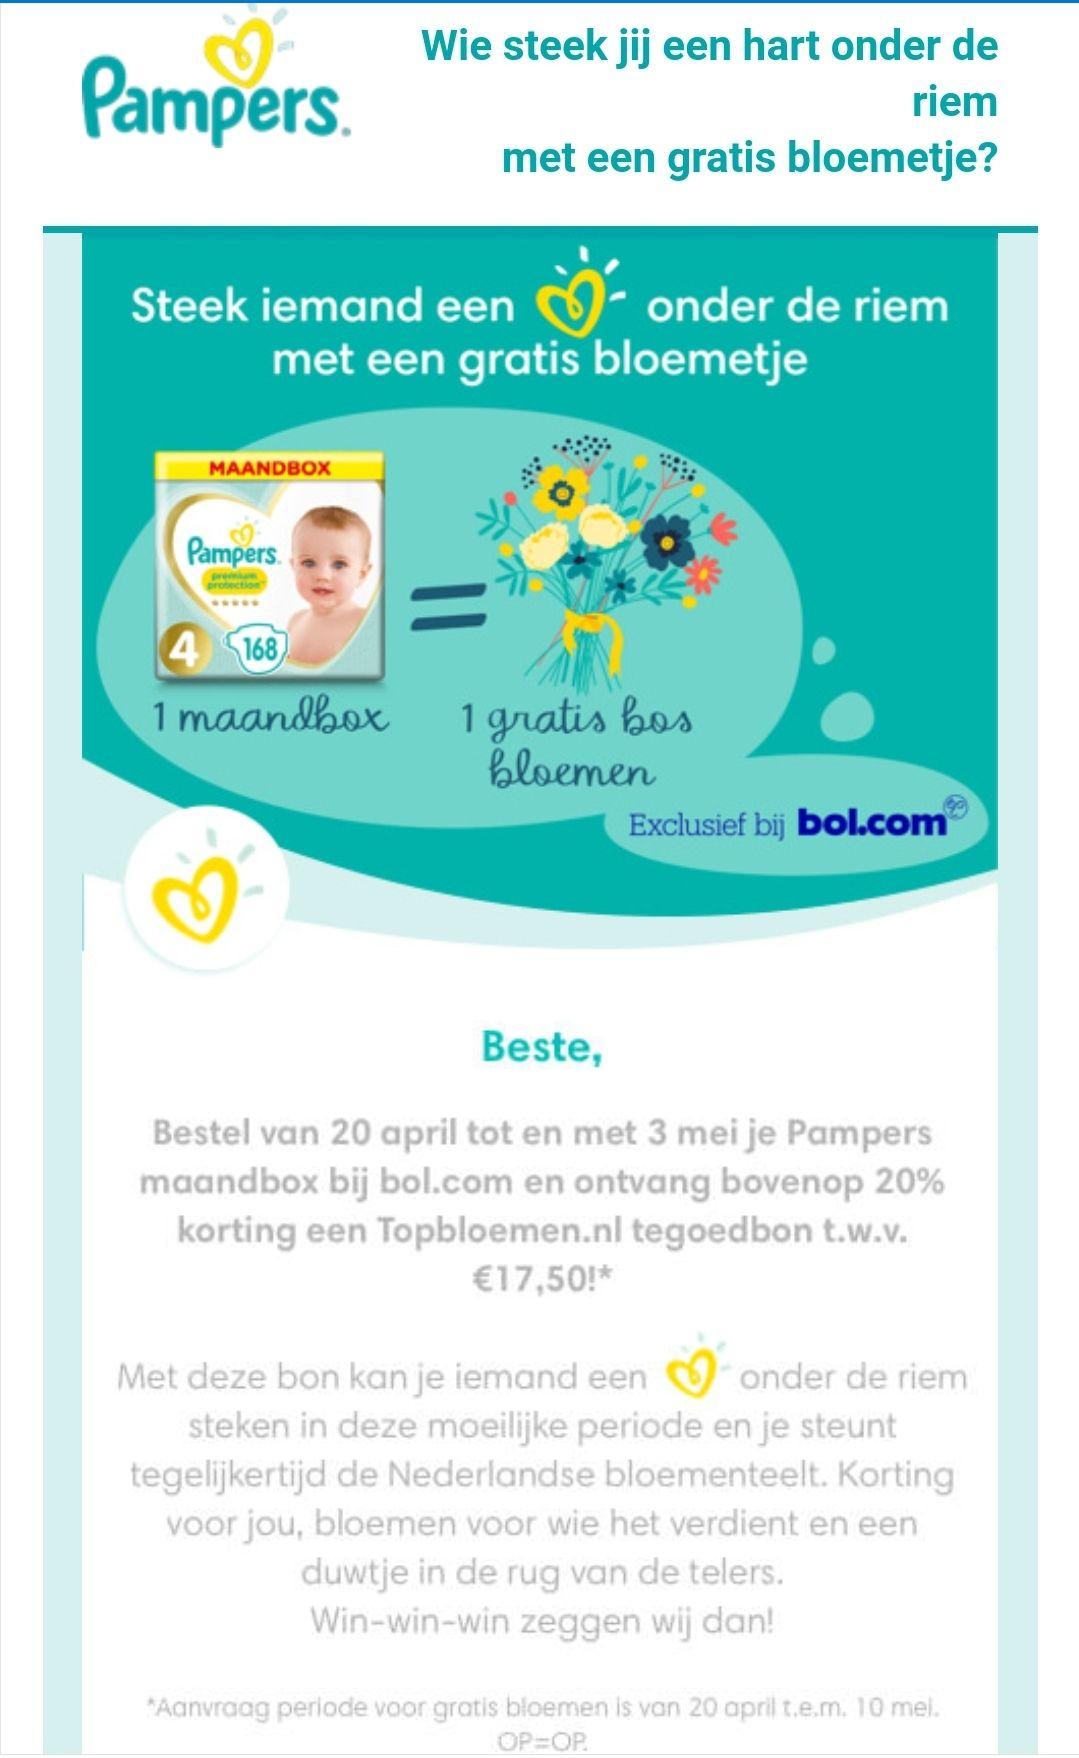 1 maandbox Pampers @ Bol.com = 1 bos bloemen @ Topbloemen.nl